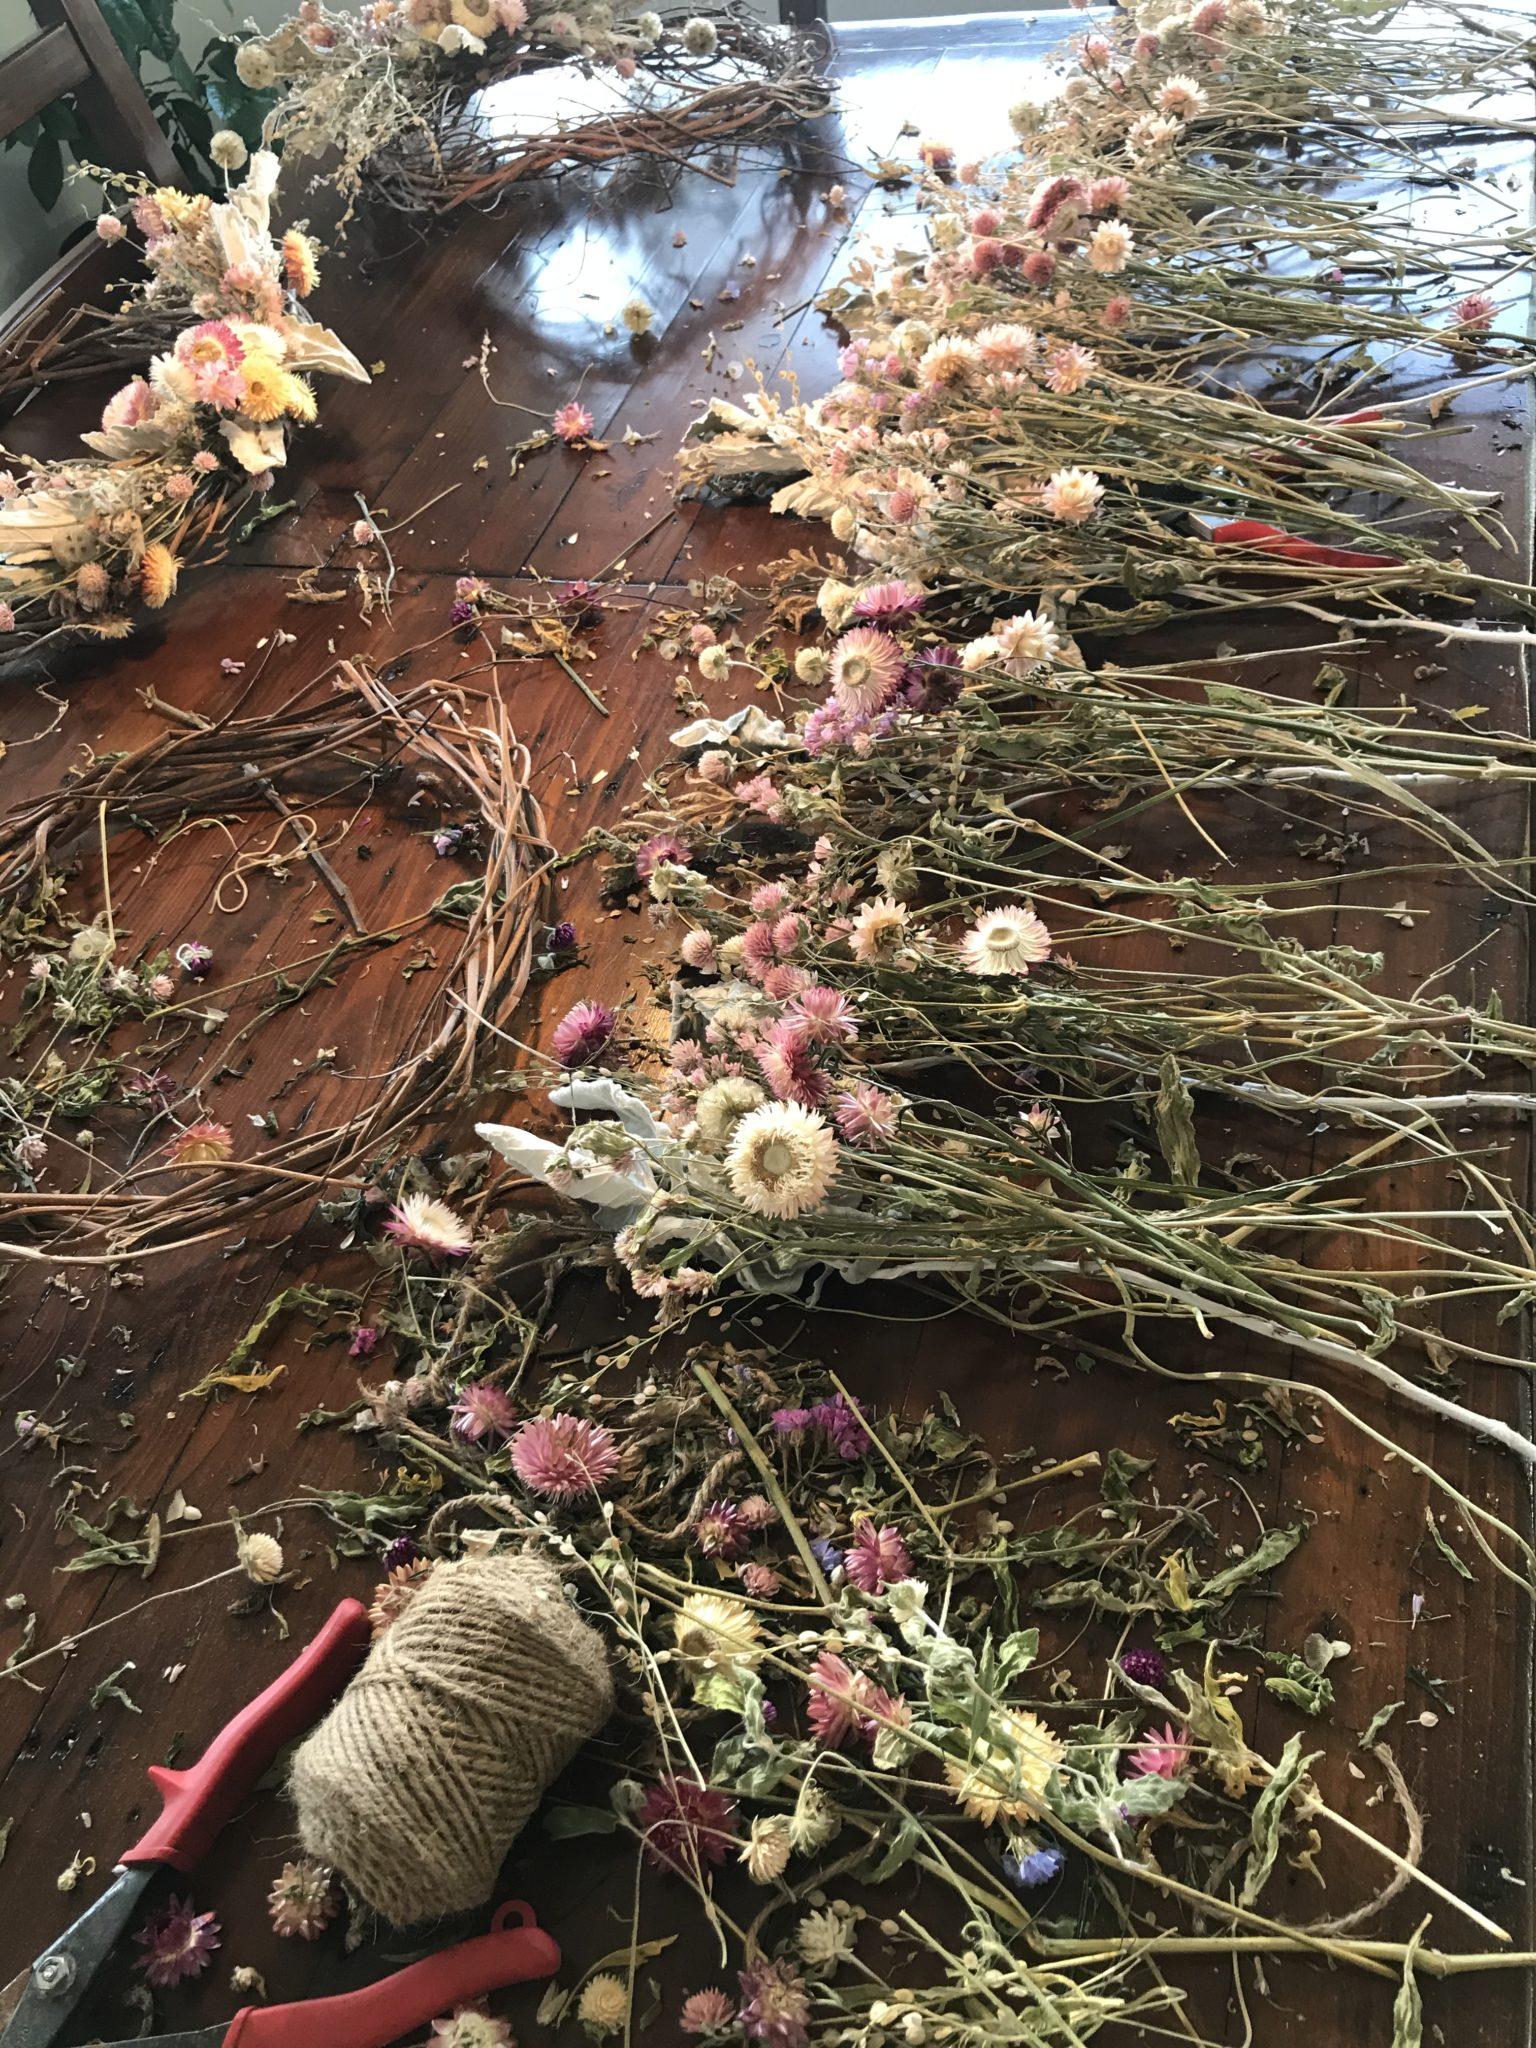 Flower wreath-making